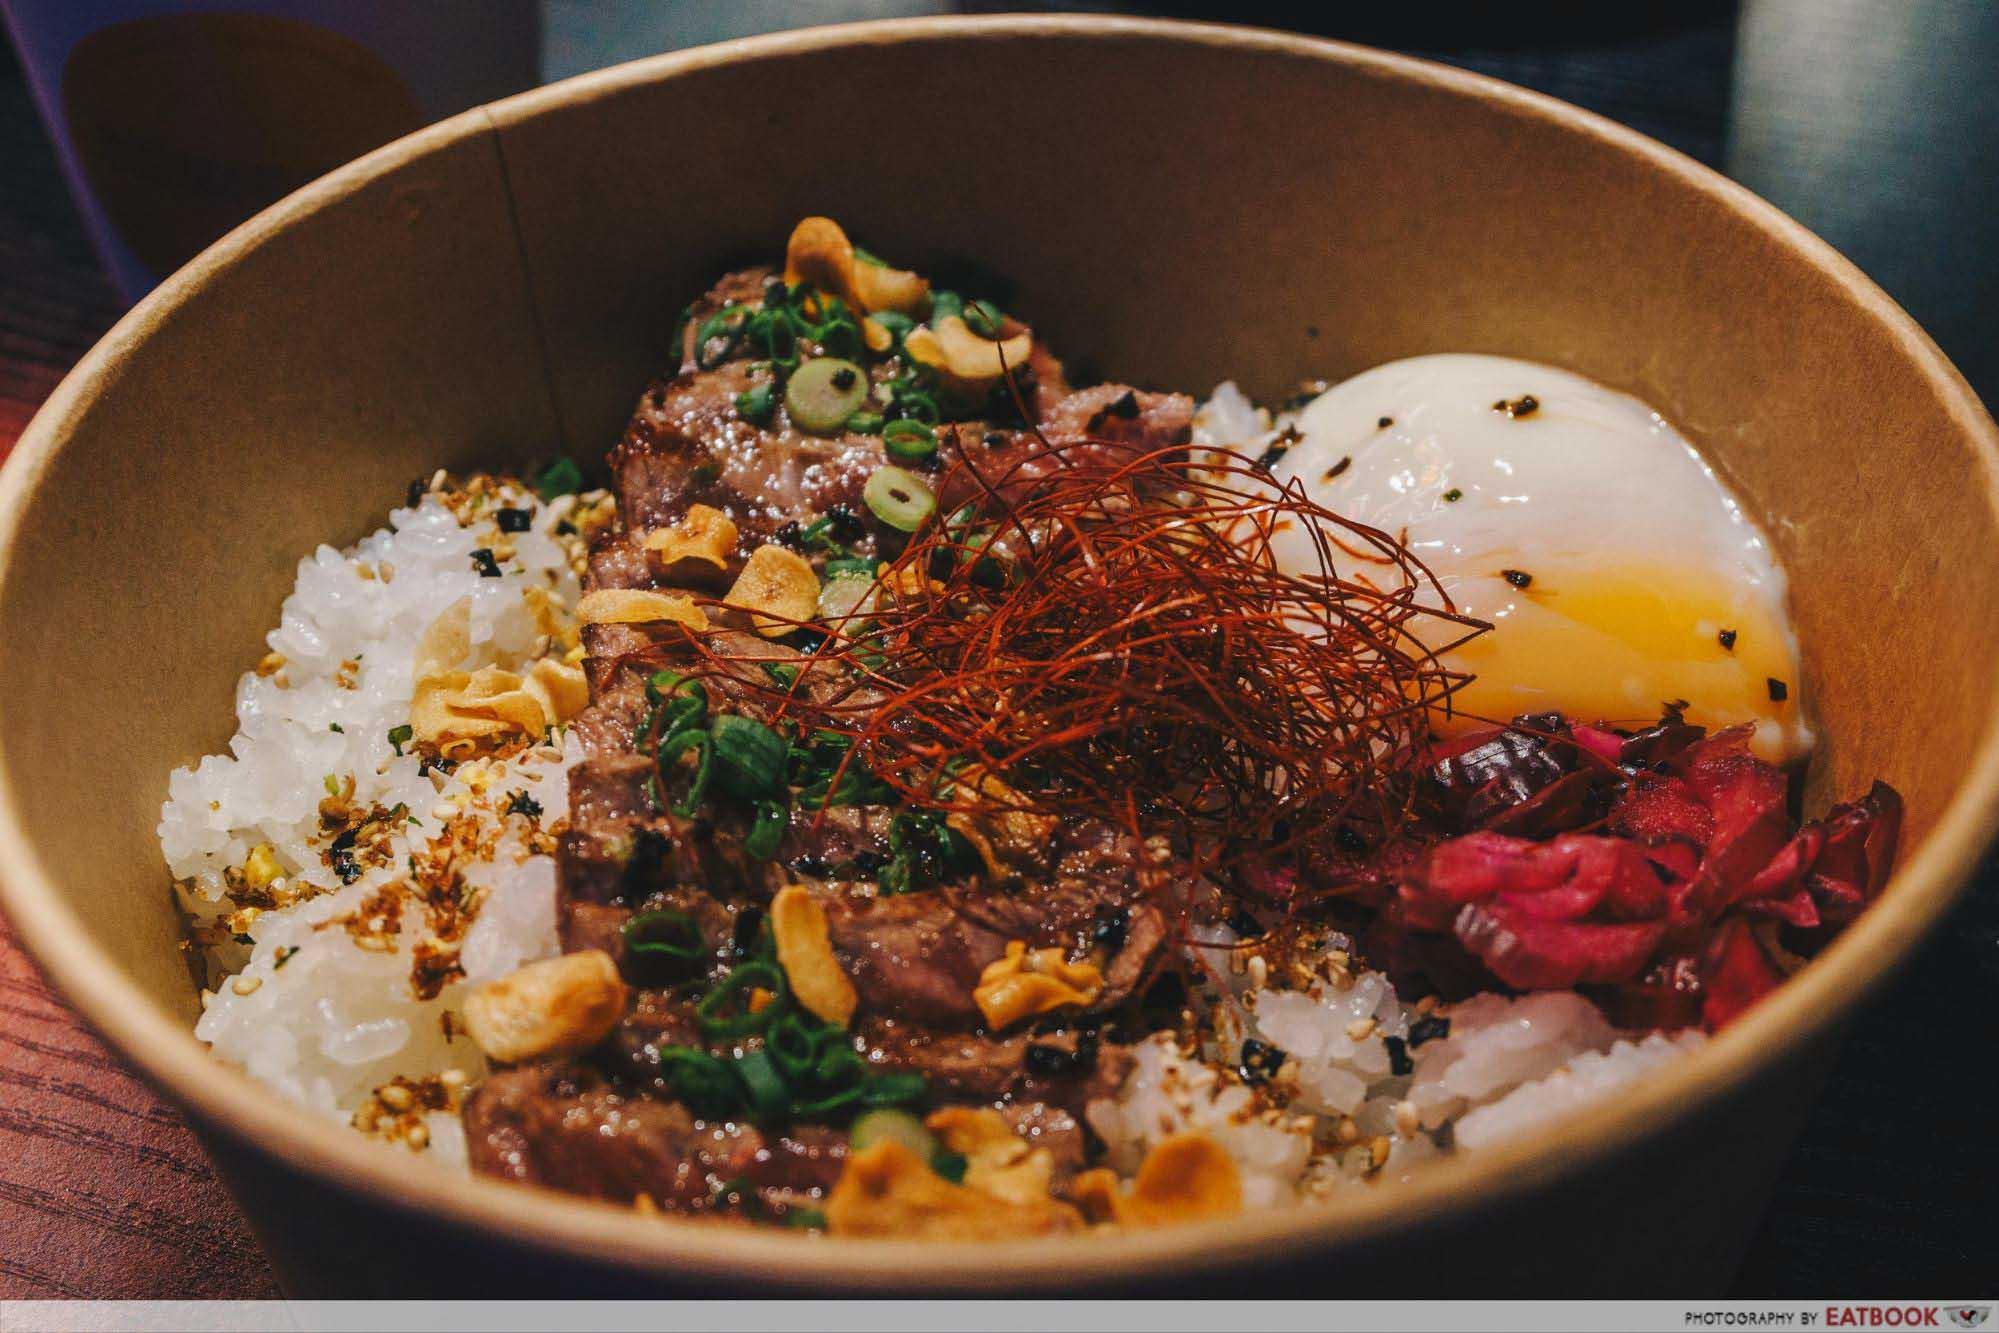 New Restaurants September 2018 - Tokidon Food